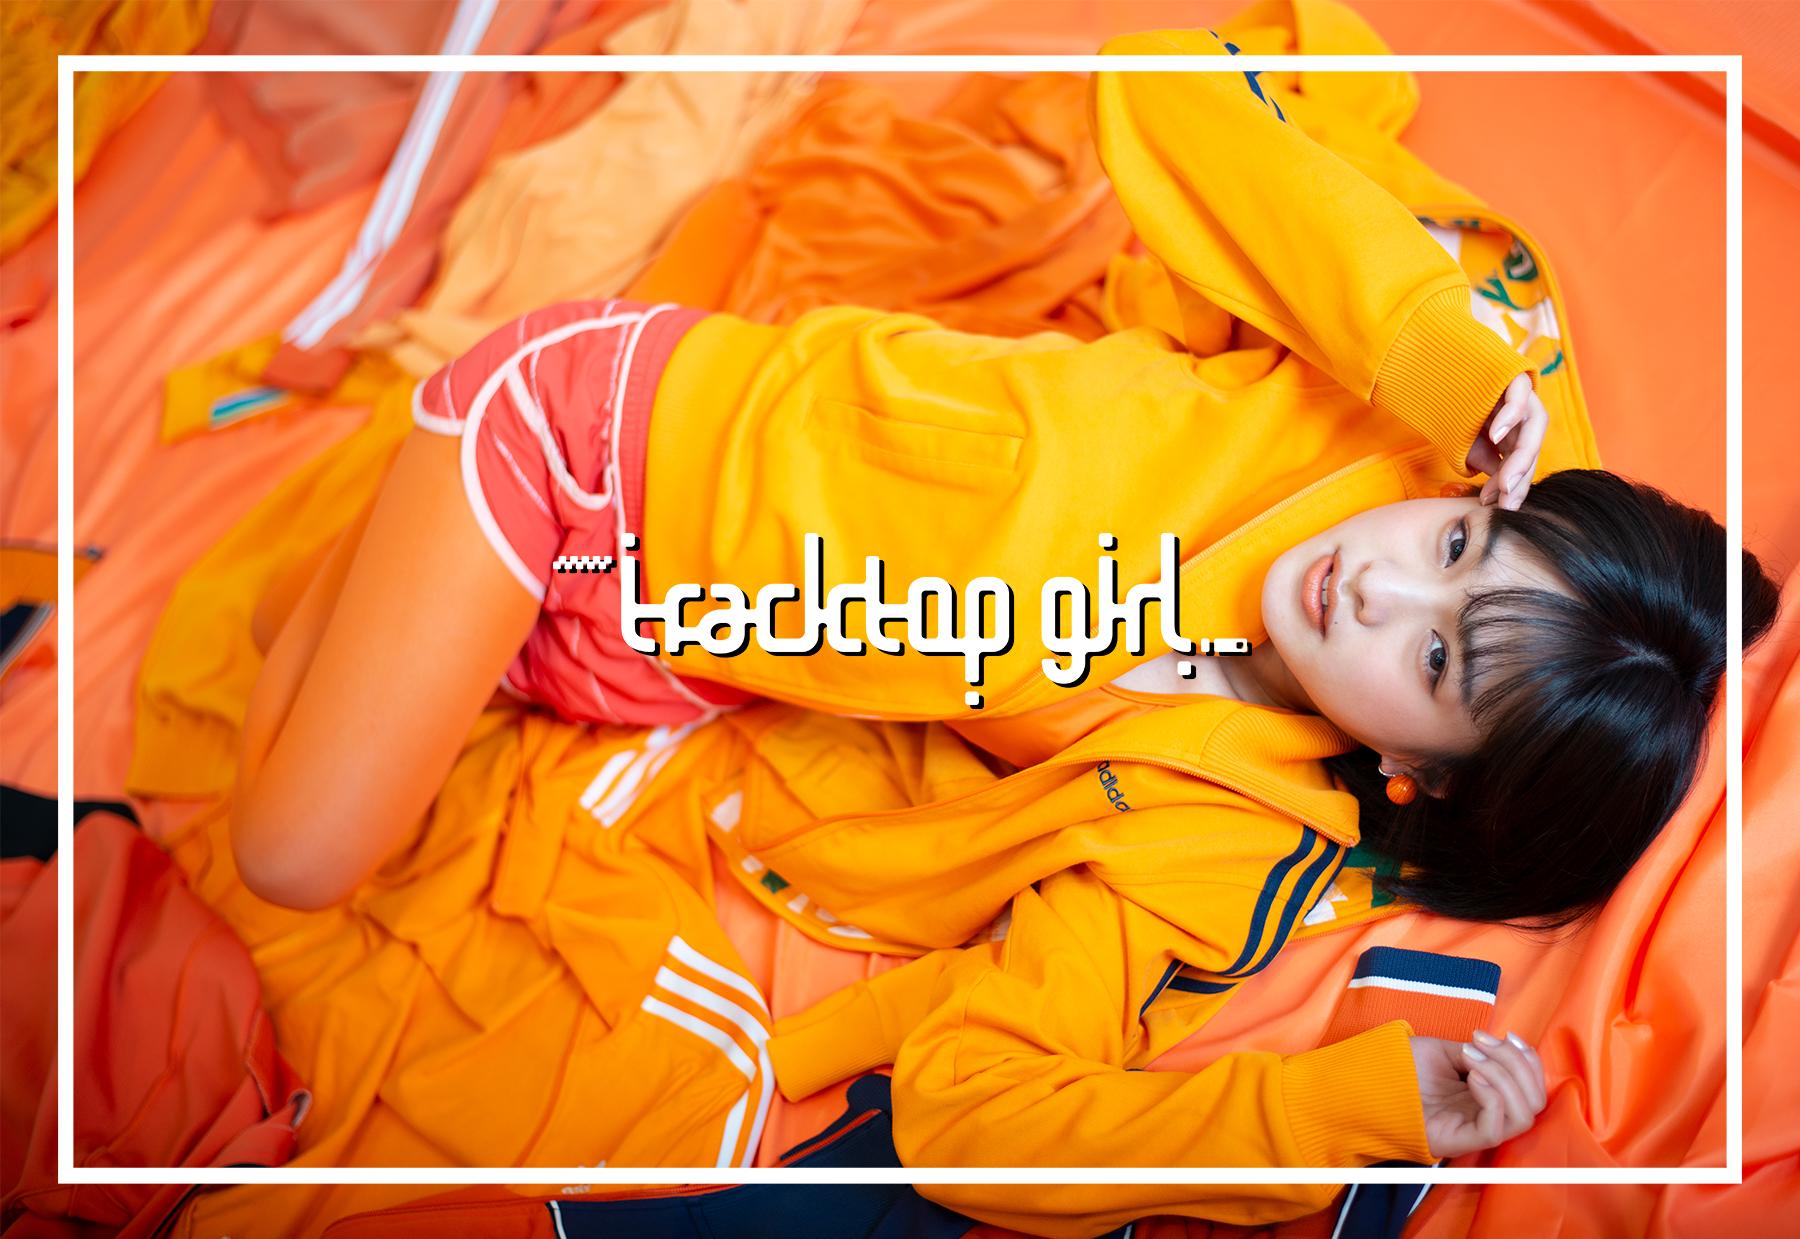 tracktop girl